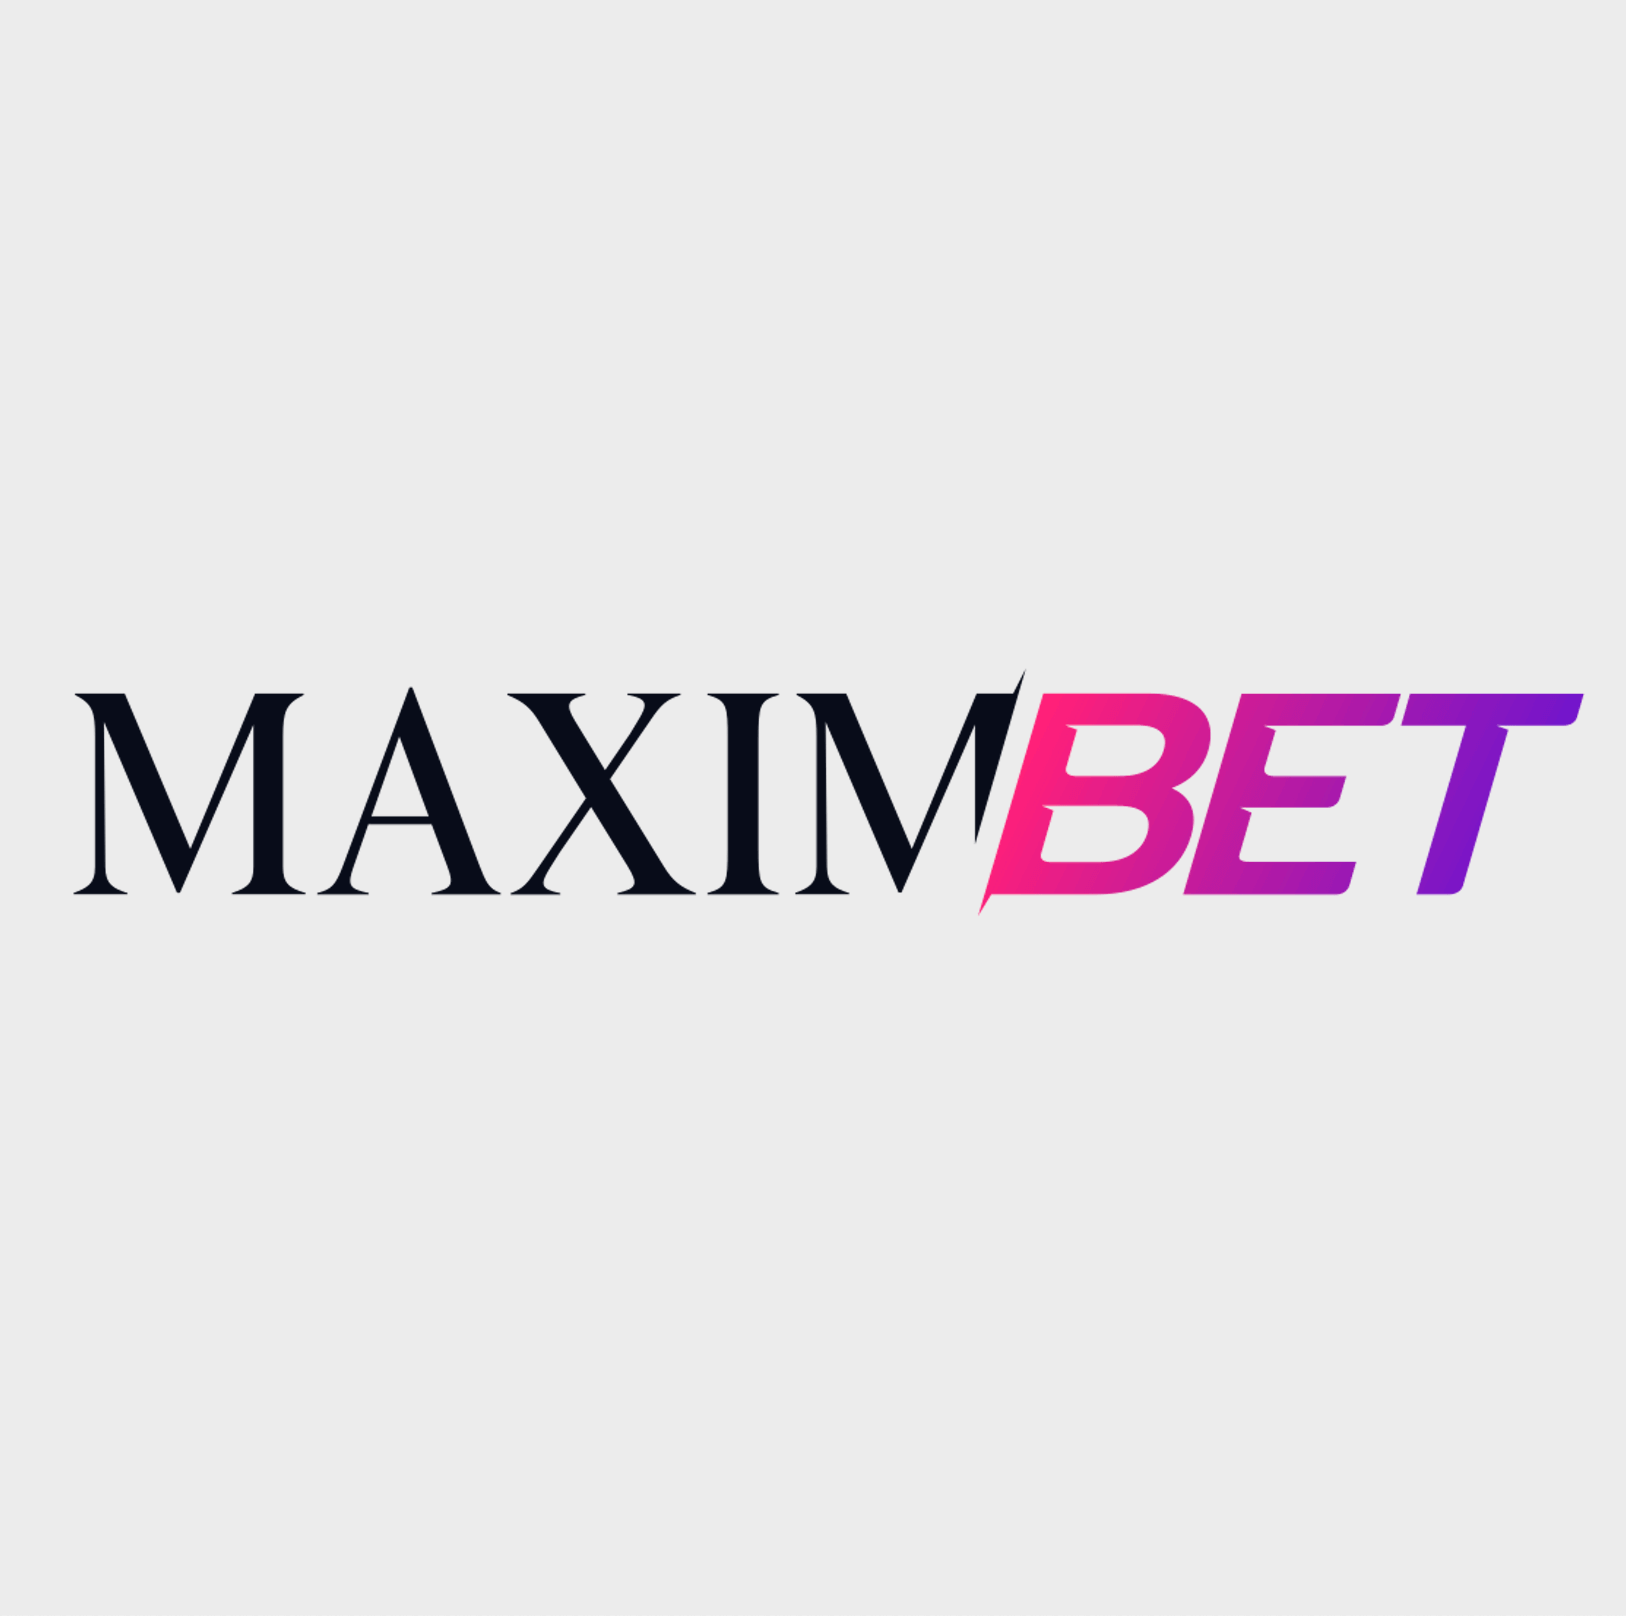 MaximBet